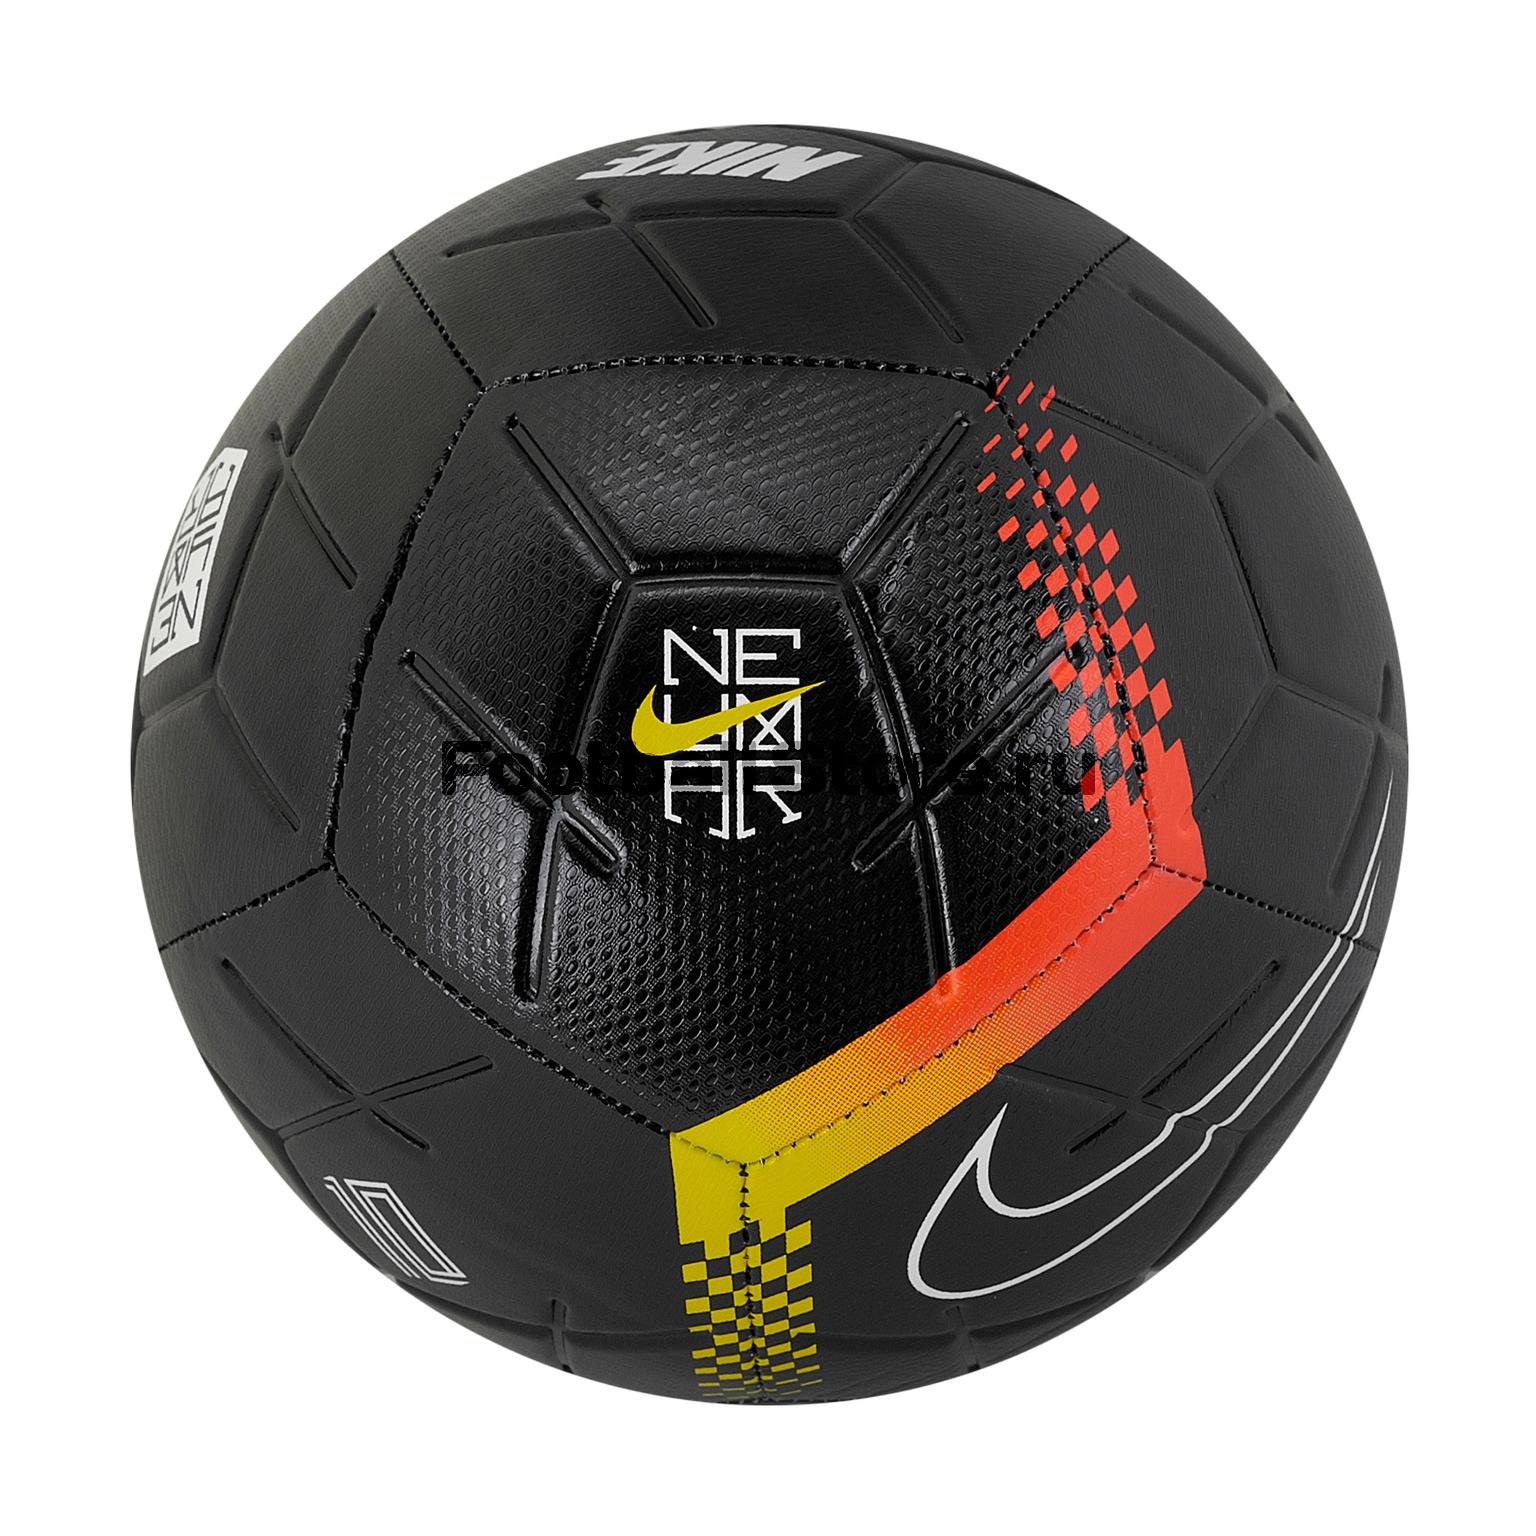 Фото - Футбольный мяч Nike Neymar Strike SC3772-010 футбольный мяч nike barcelona strike sc3365 455